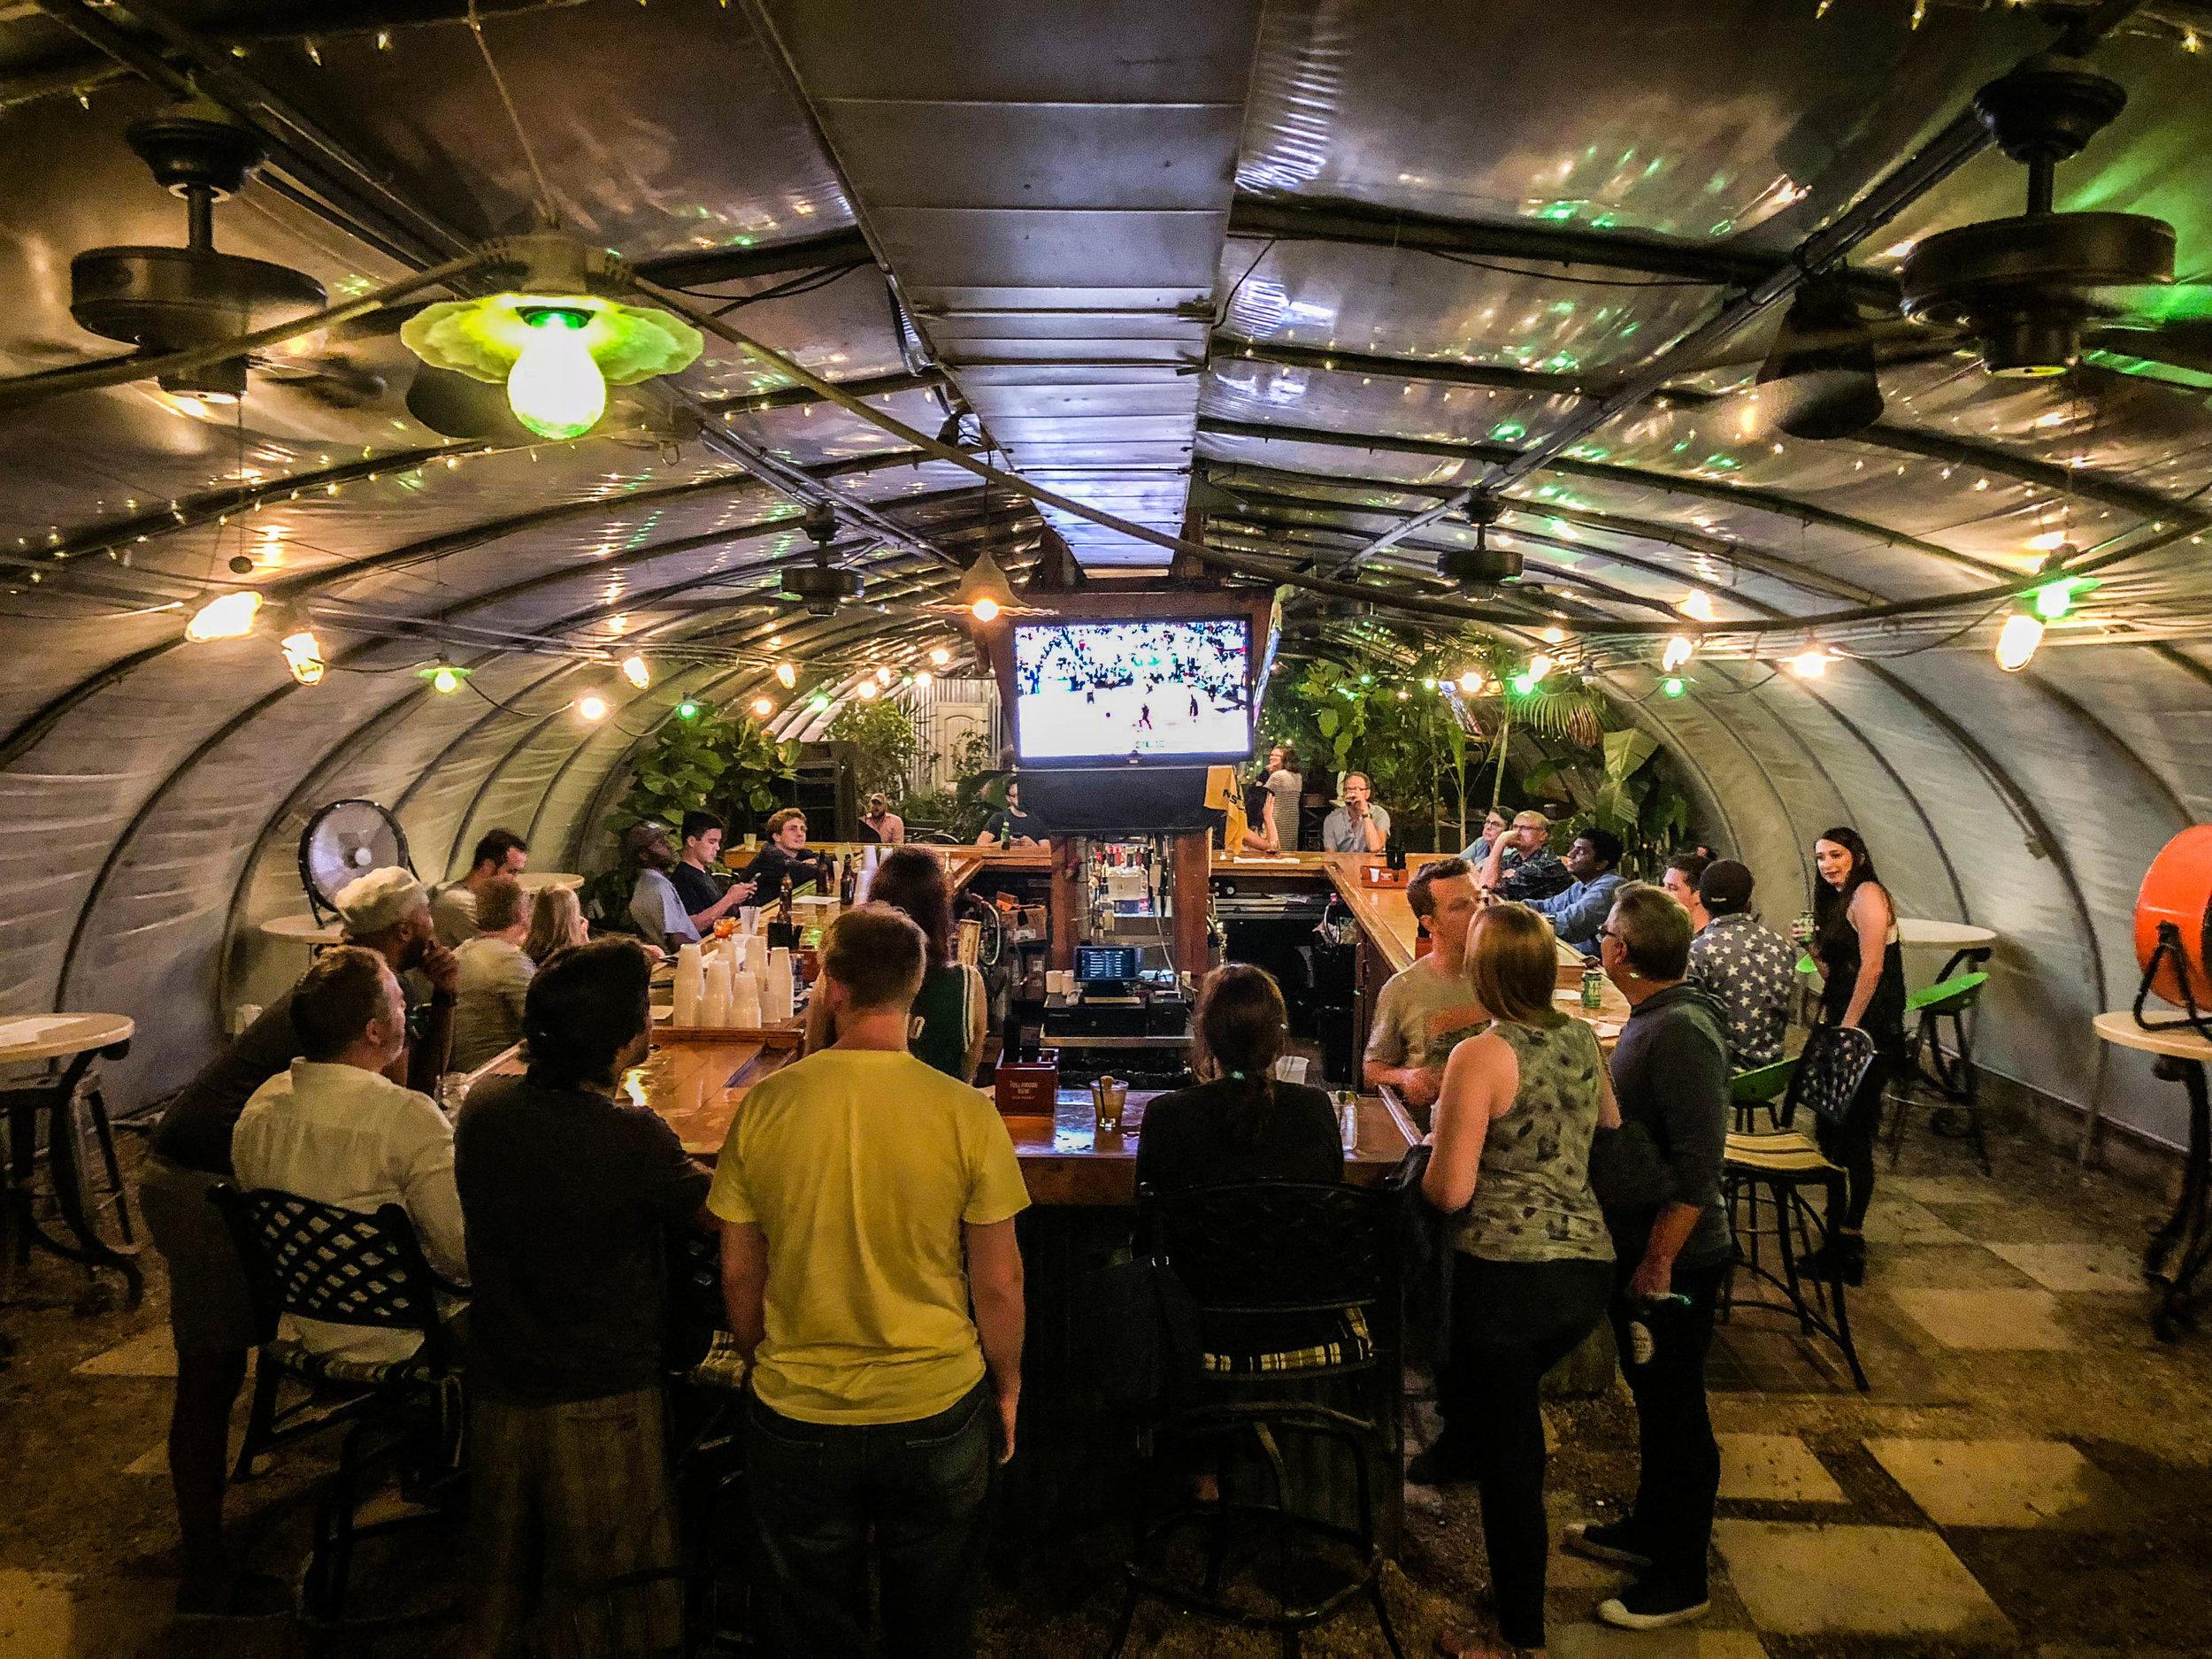 greenhouse-bar-nashville-nightlife-4.jpg